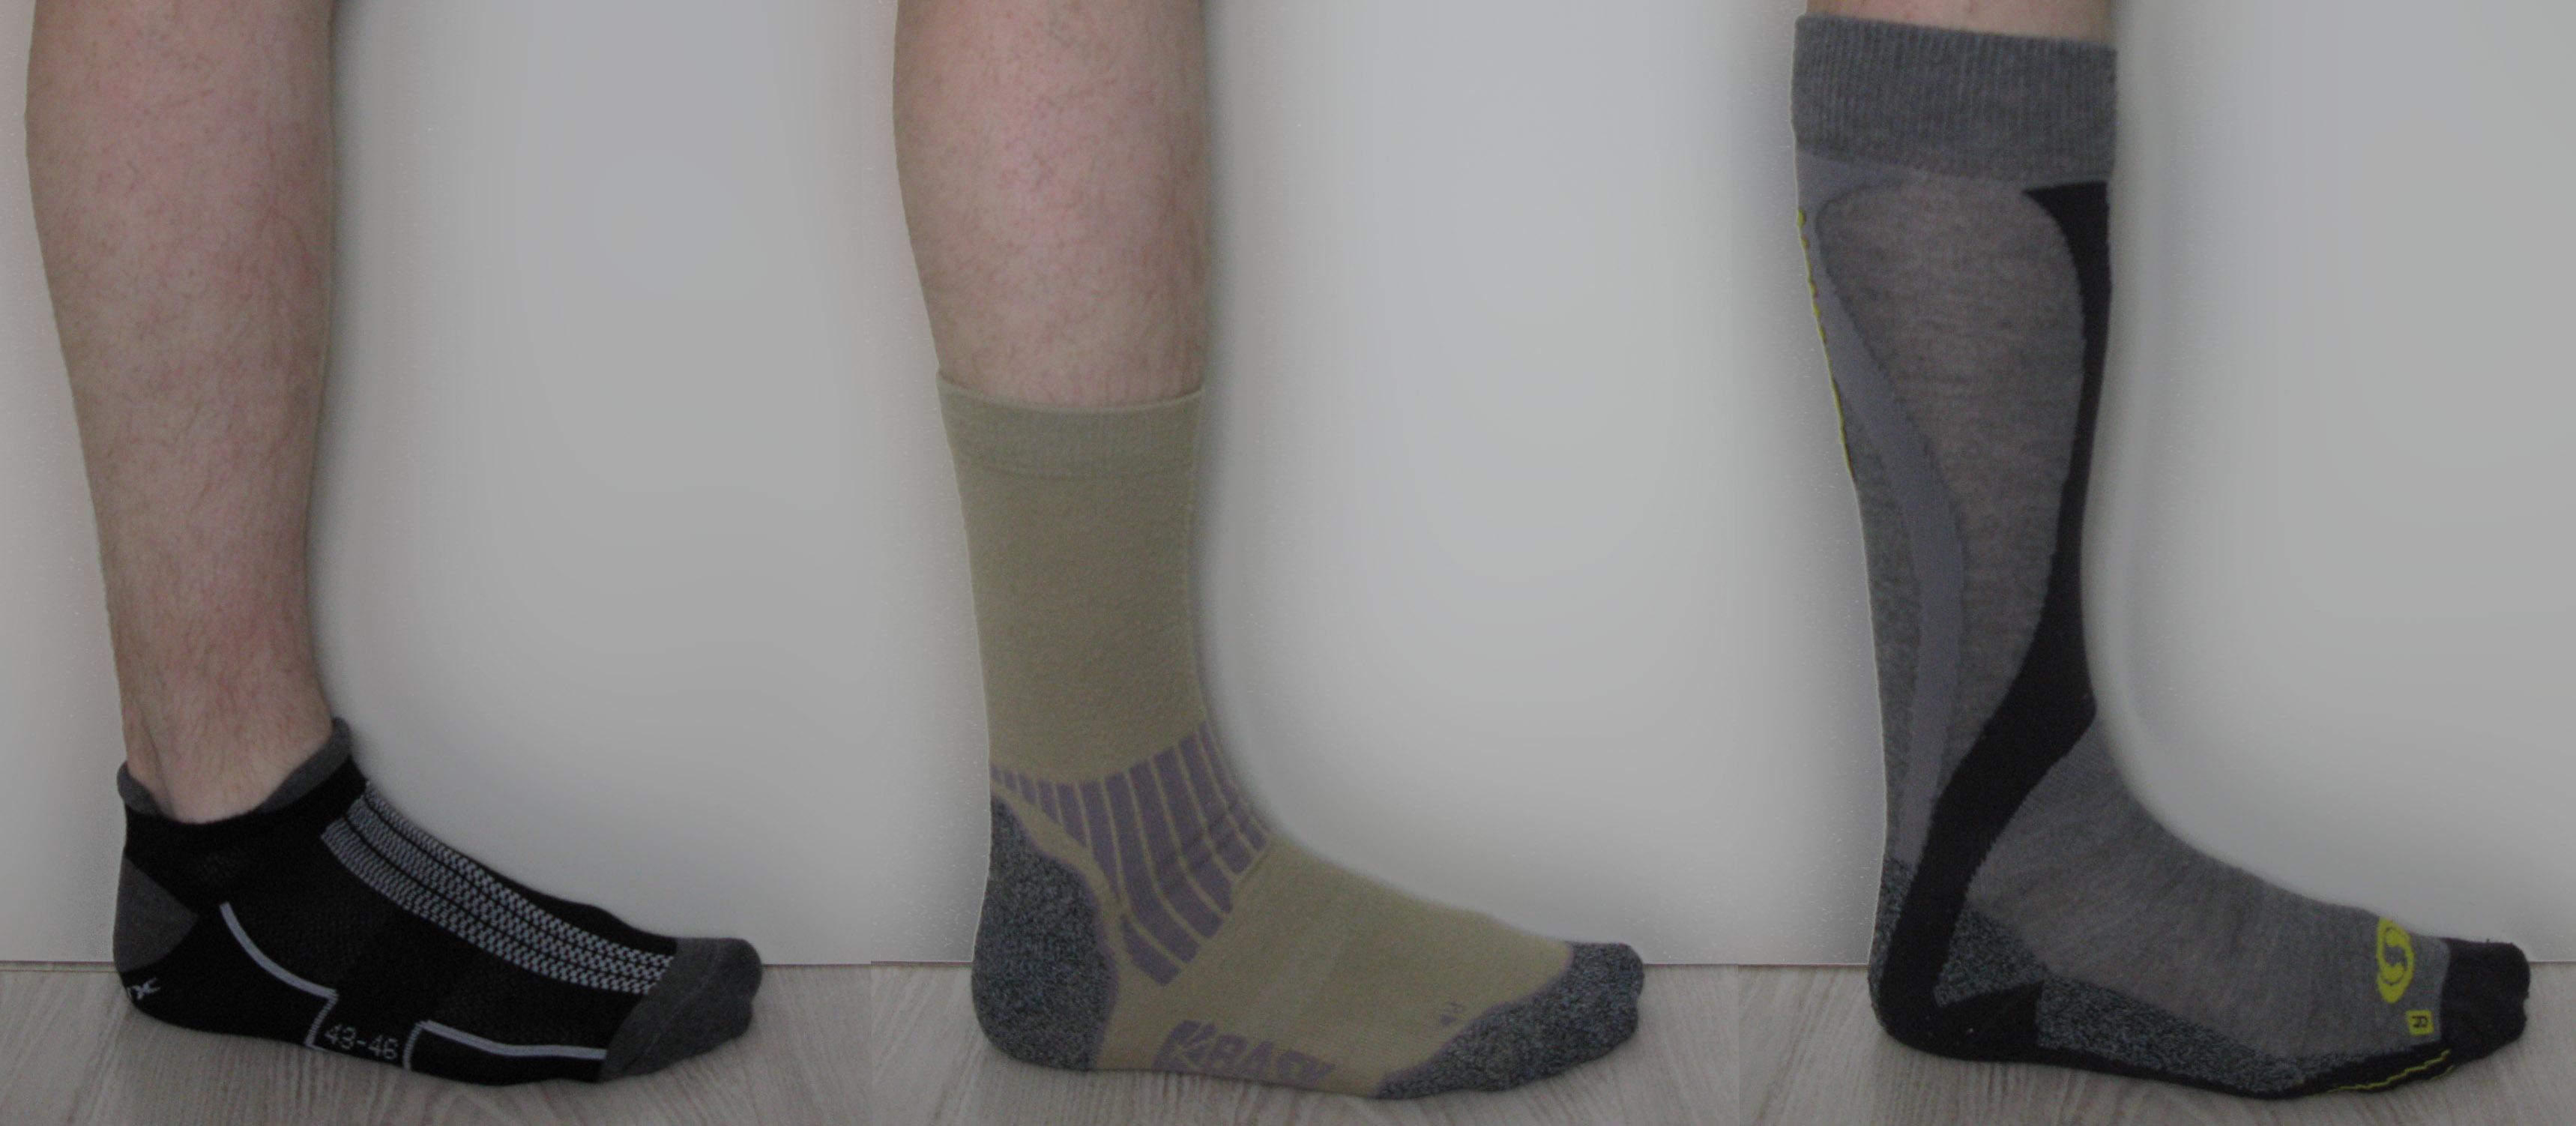 lourens-devushki-v-noskah-adidas-zhopi-vechernih